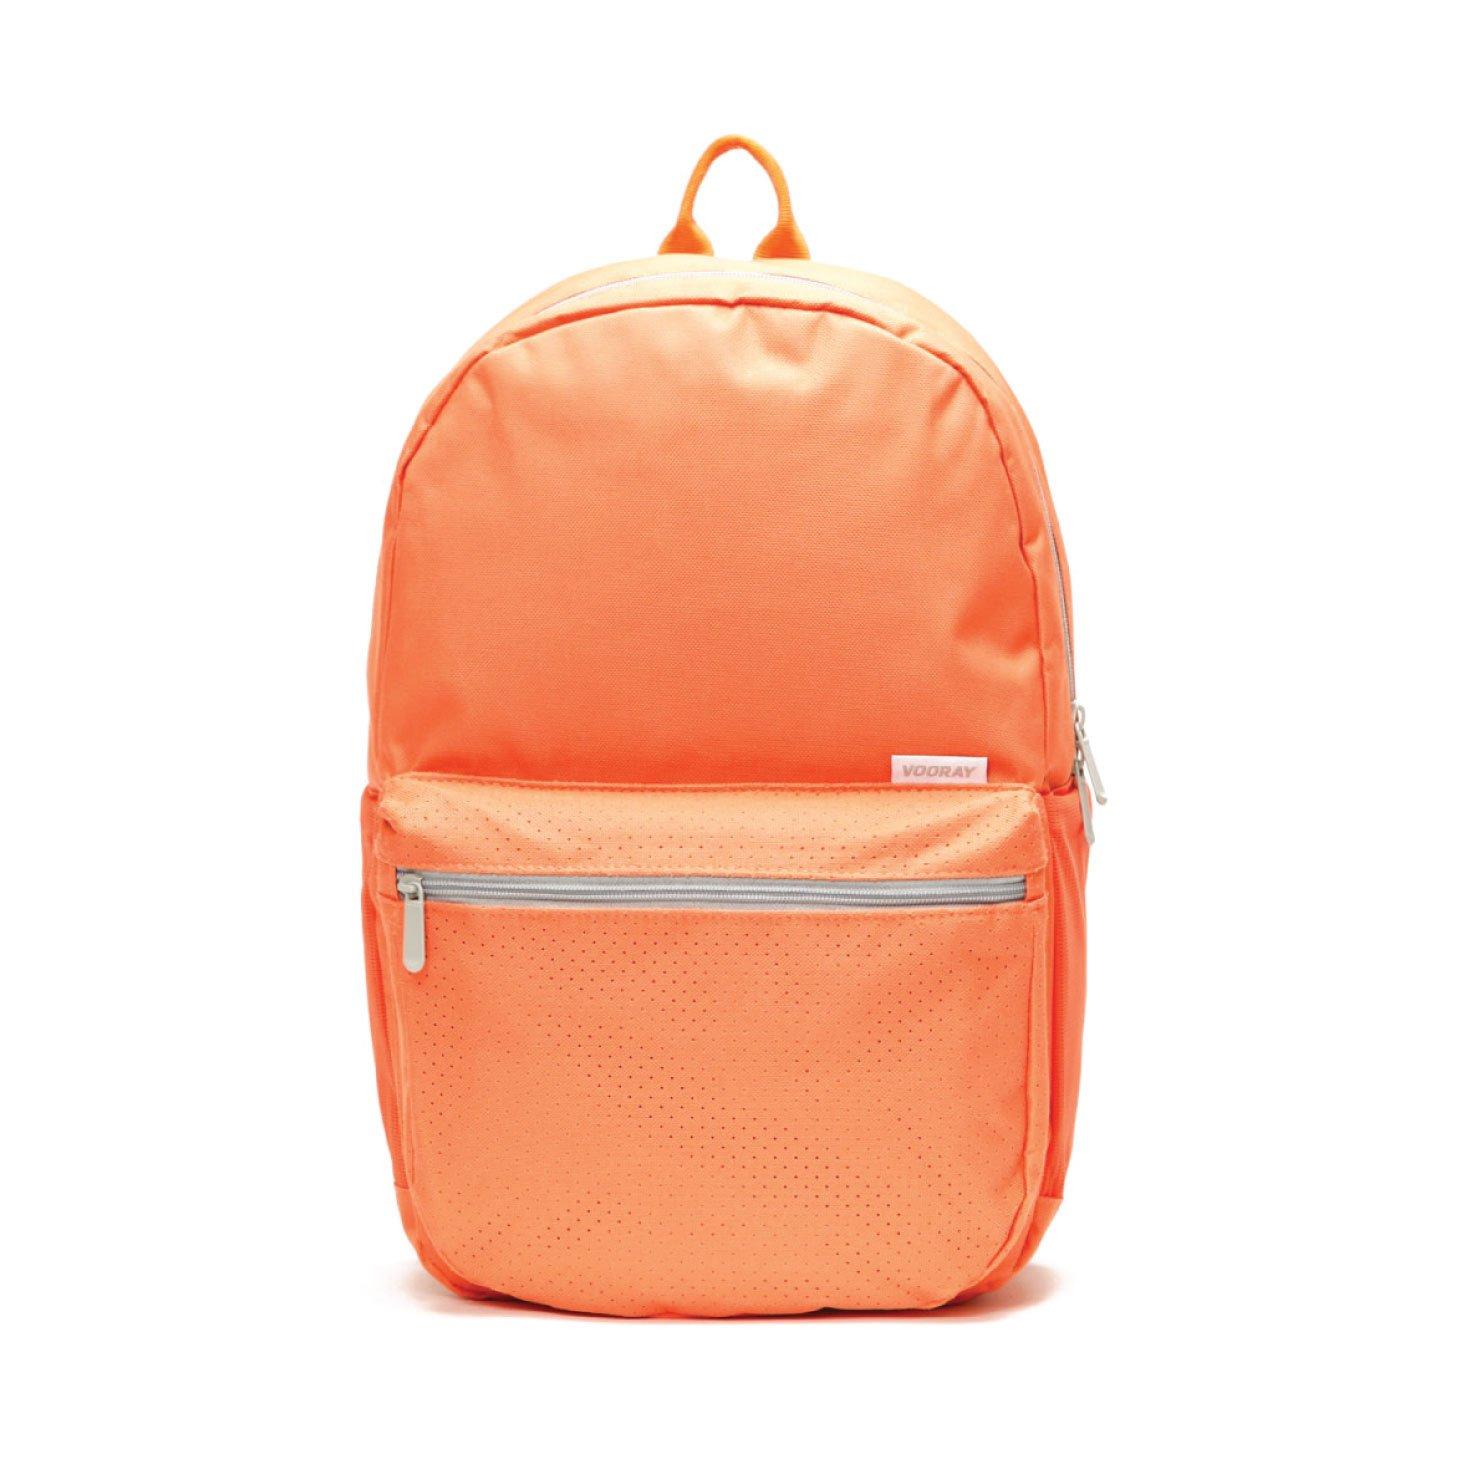 ACE Backpack, Blaze Orange – VOORAY